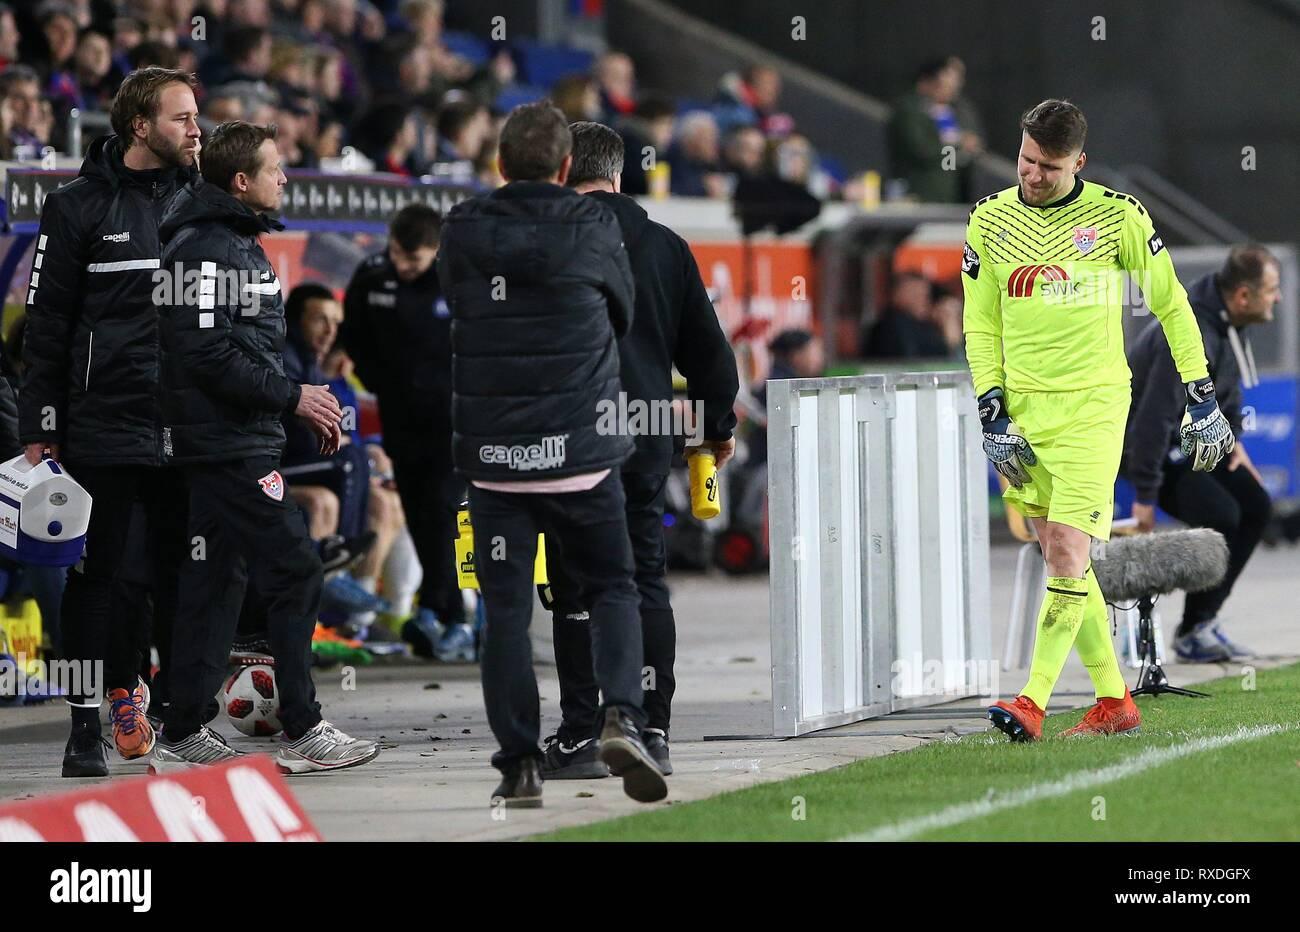 firo: 08.03.2019 Football, 3. Bundesliga, Season 2018/2019 KFC Uerdingen 05 - Karlsruher SC goalkeeper Renv © Vollath (# 1, KFC Uerdingen 05) can not be substituted anymore. | usage worldwide - Stock Image